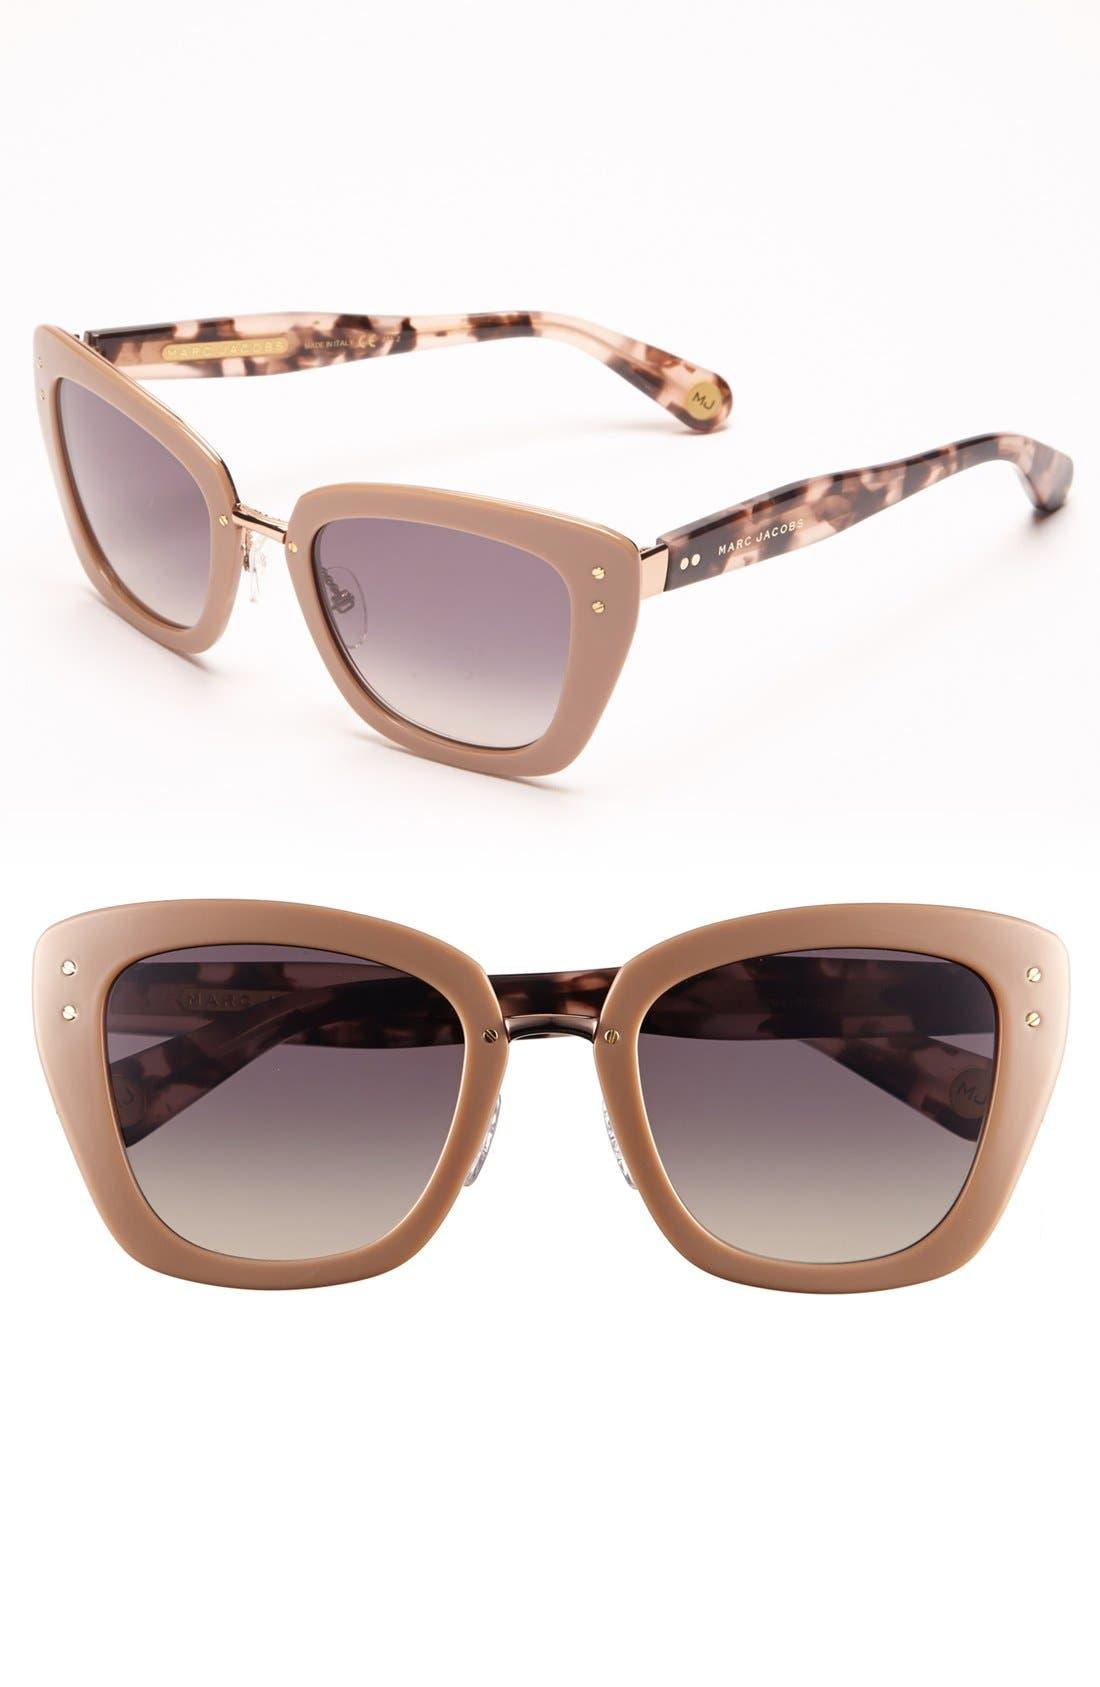 Main Image - Marc Jacobs 53mm Retro Sunglasses